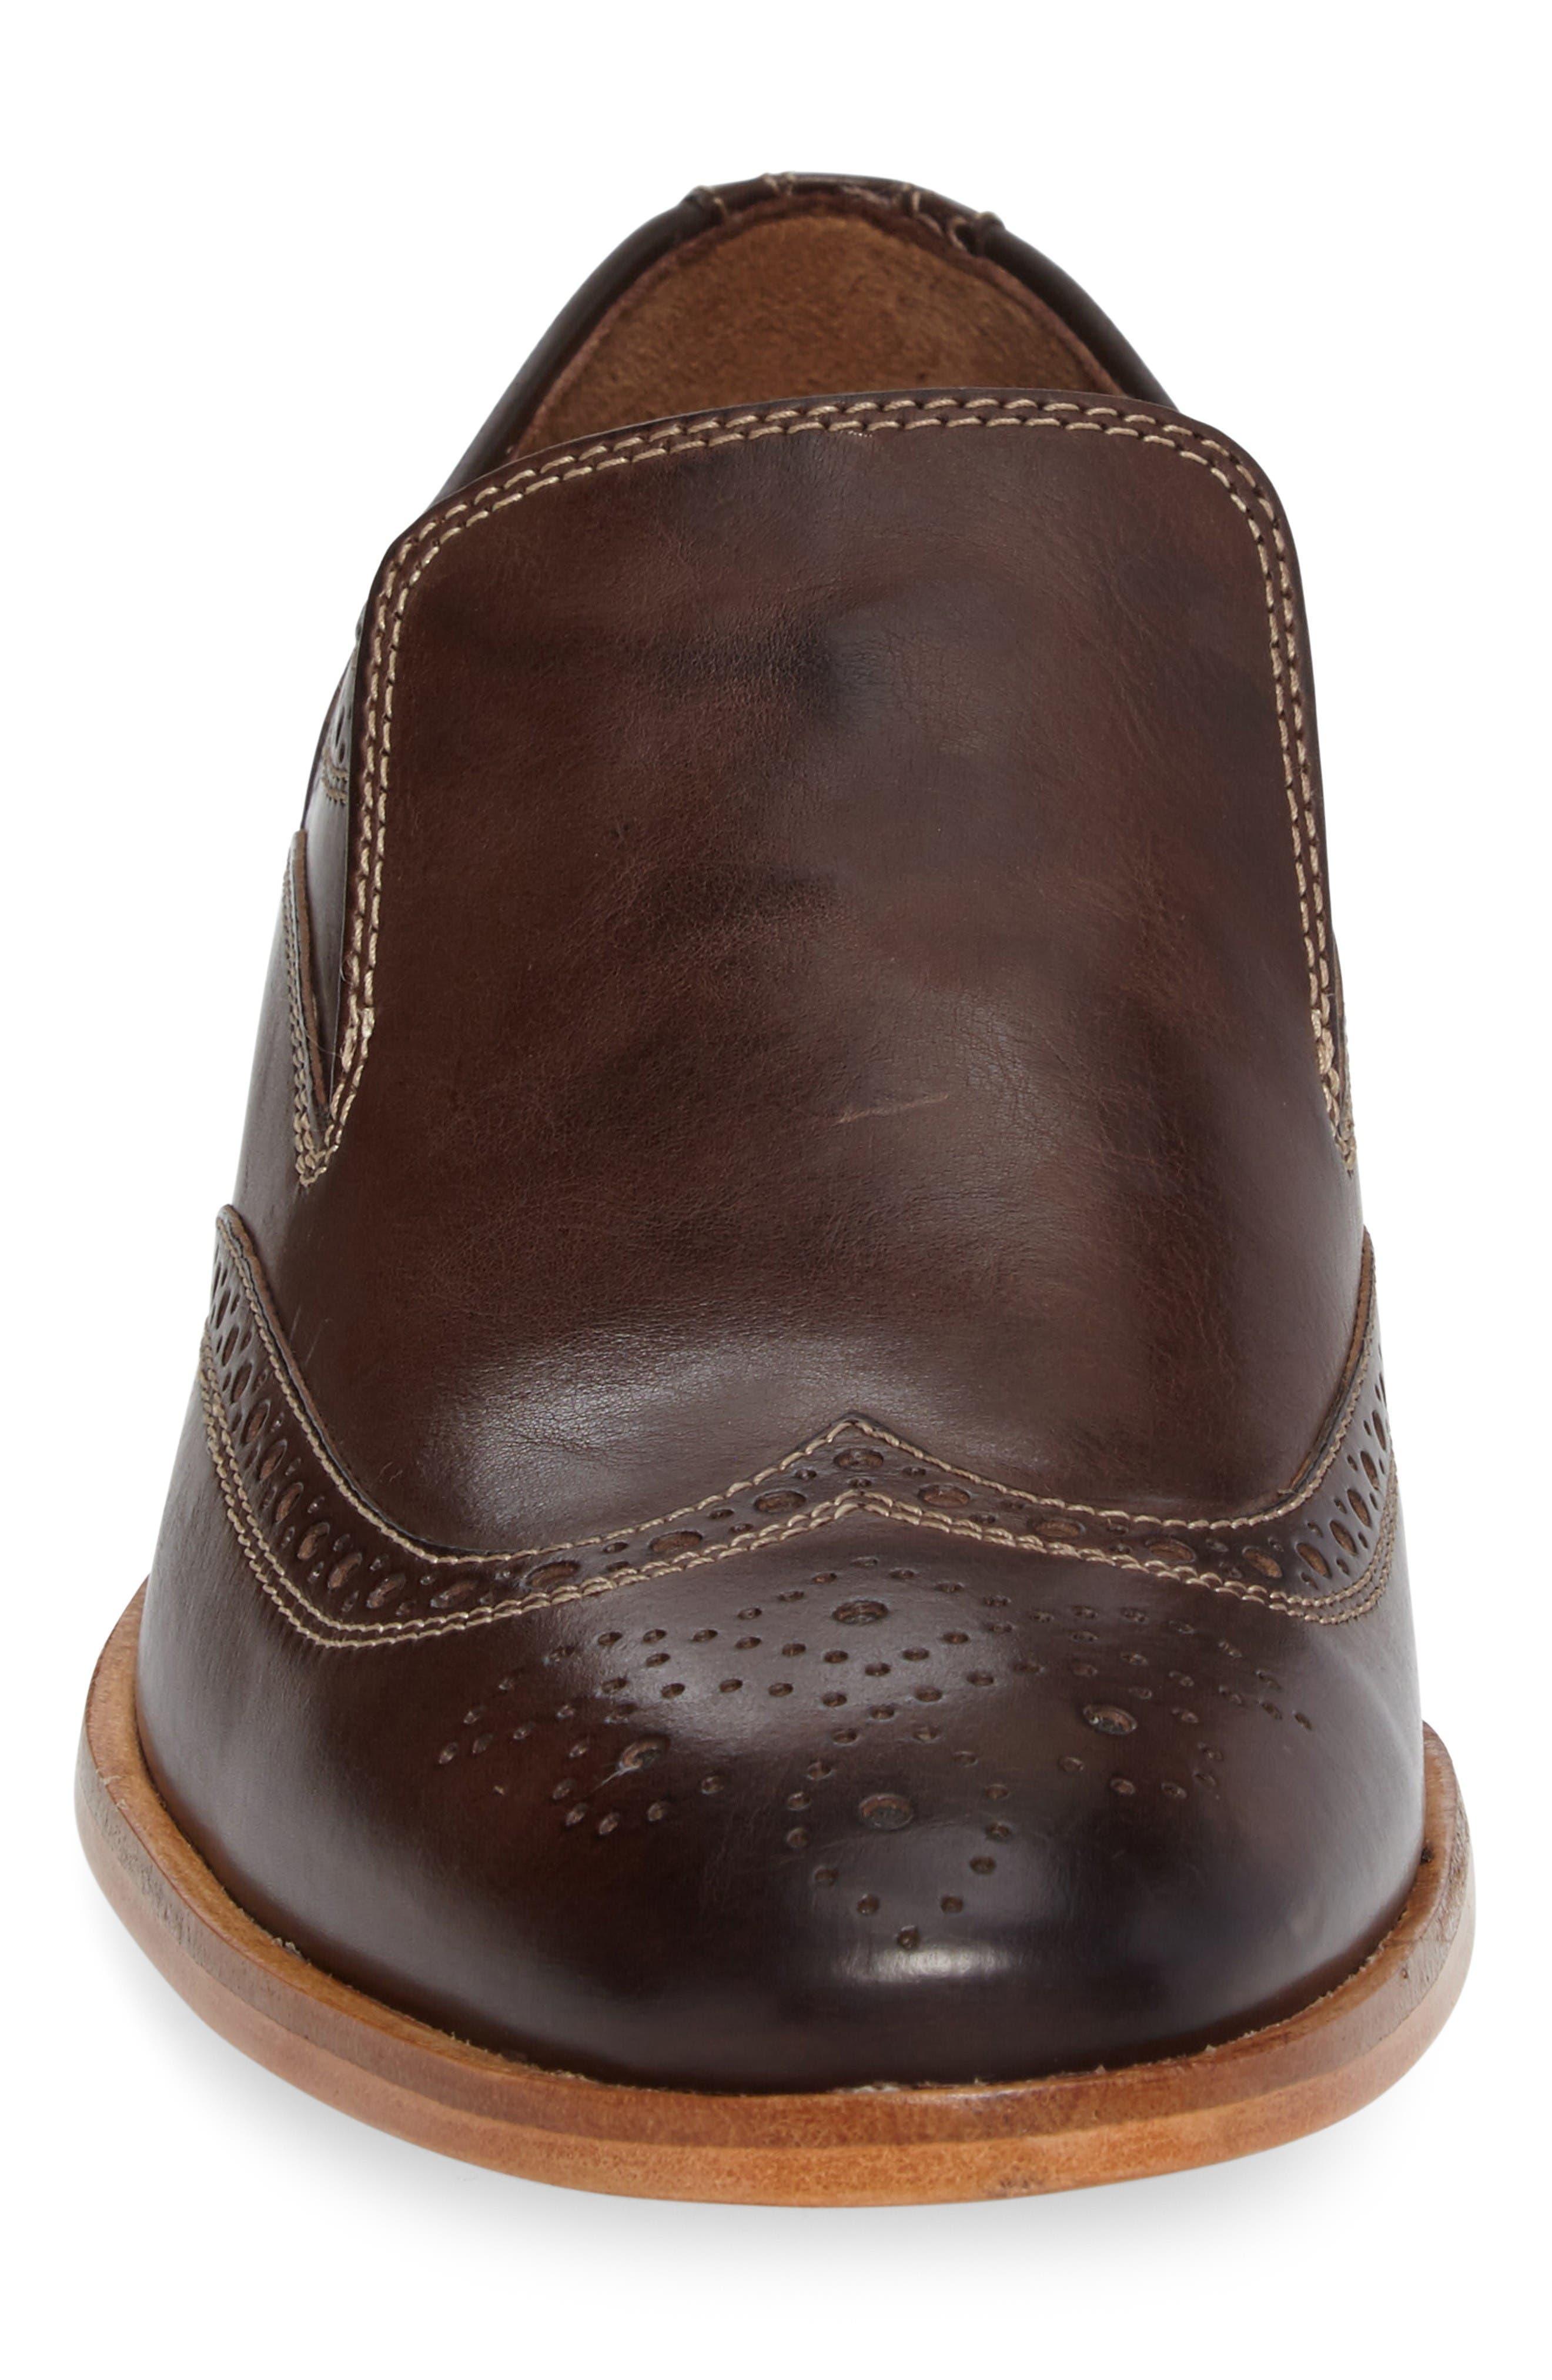 Graham Wingtip Loafer,                             Alternate thumbnail 4, color,                             Dark Brown Calfskin Leather